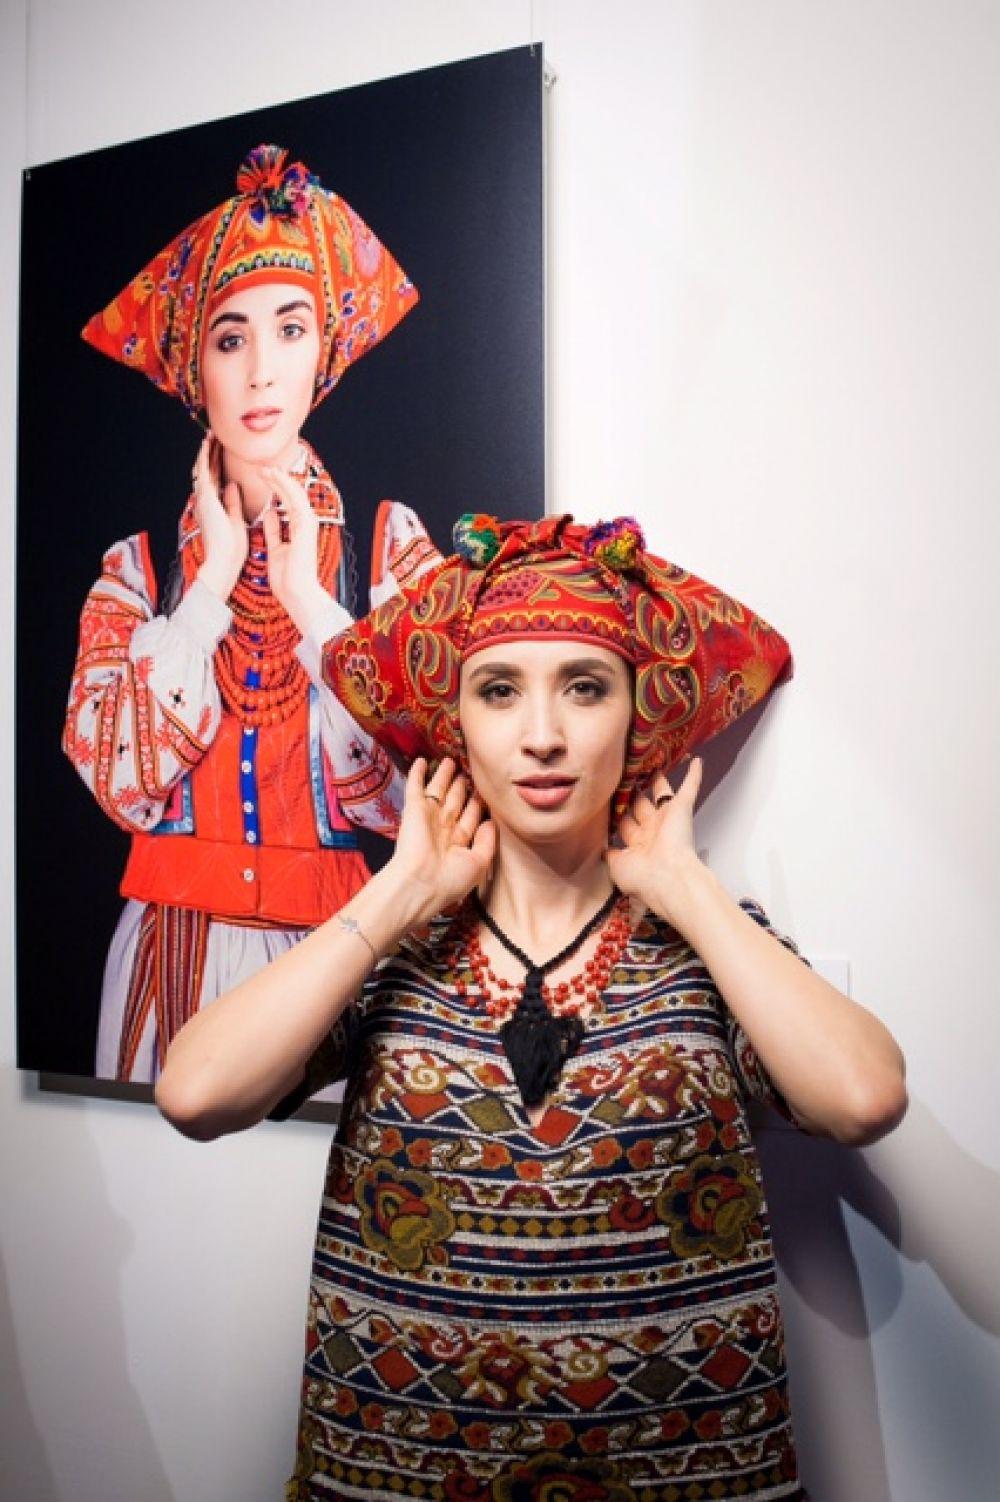 Анна Завальская - настоящая украинка